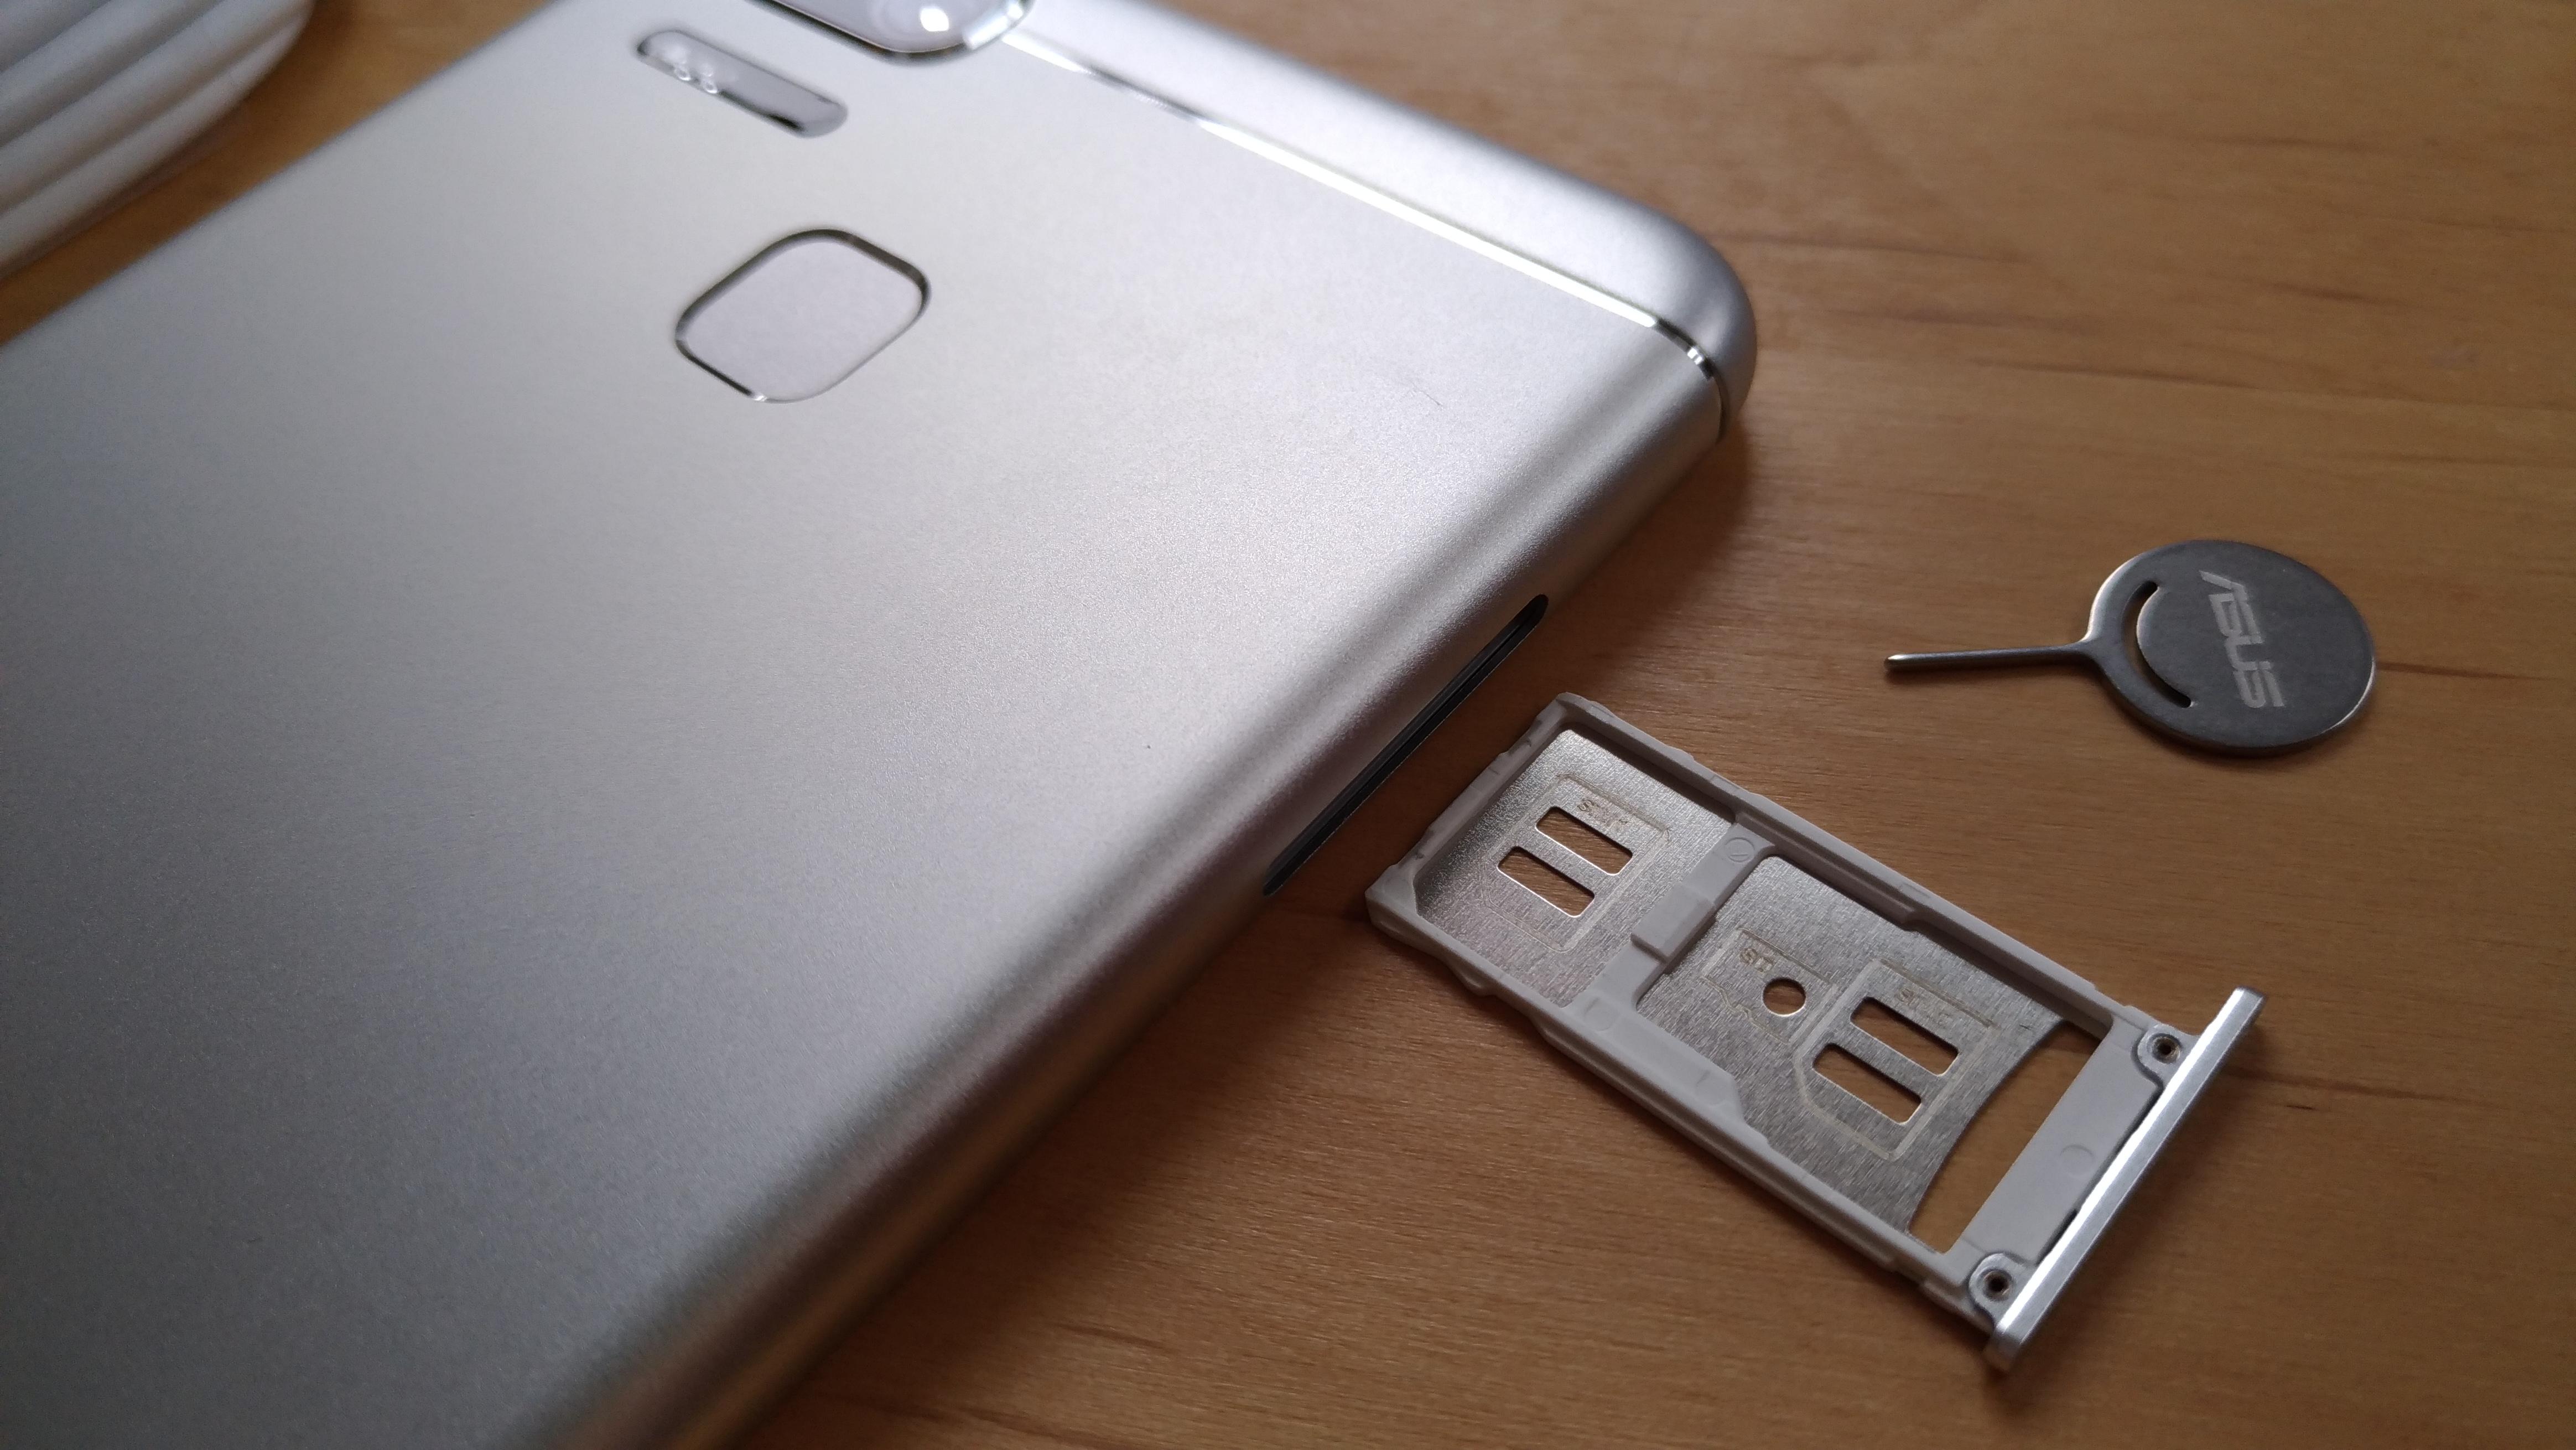 nanoSIM2枚またはnanoSIM1枚&microSDを装着